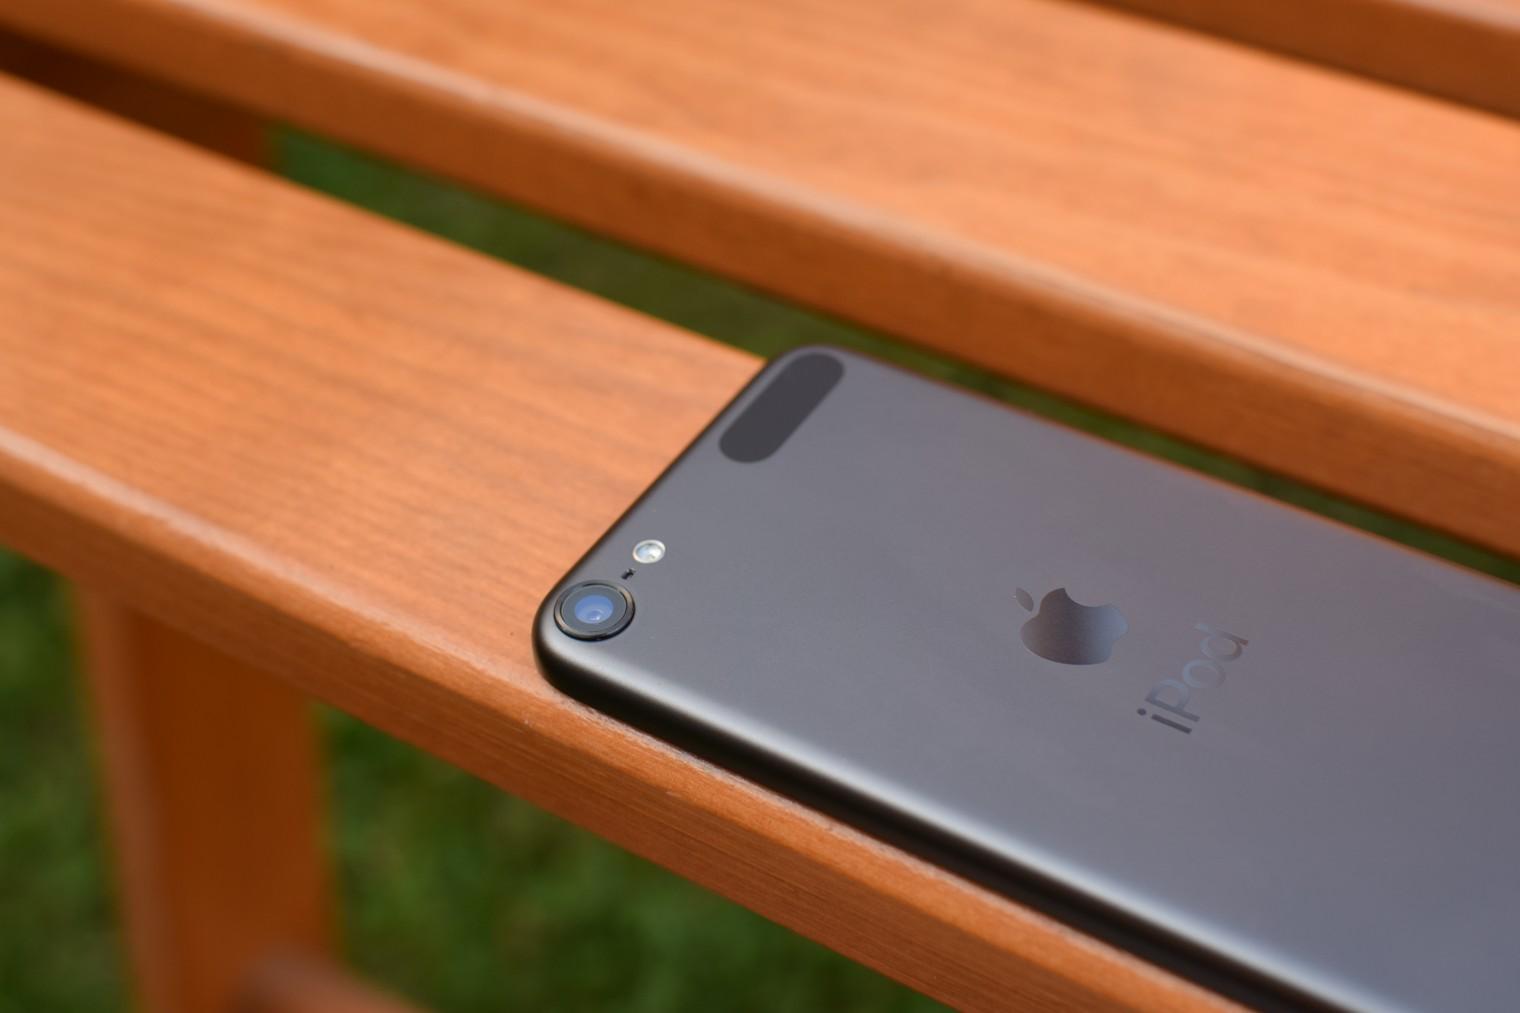 iPod touch (2019) na zidli ze shora - detail na fotoaparat